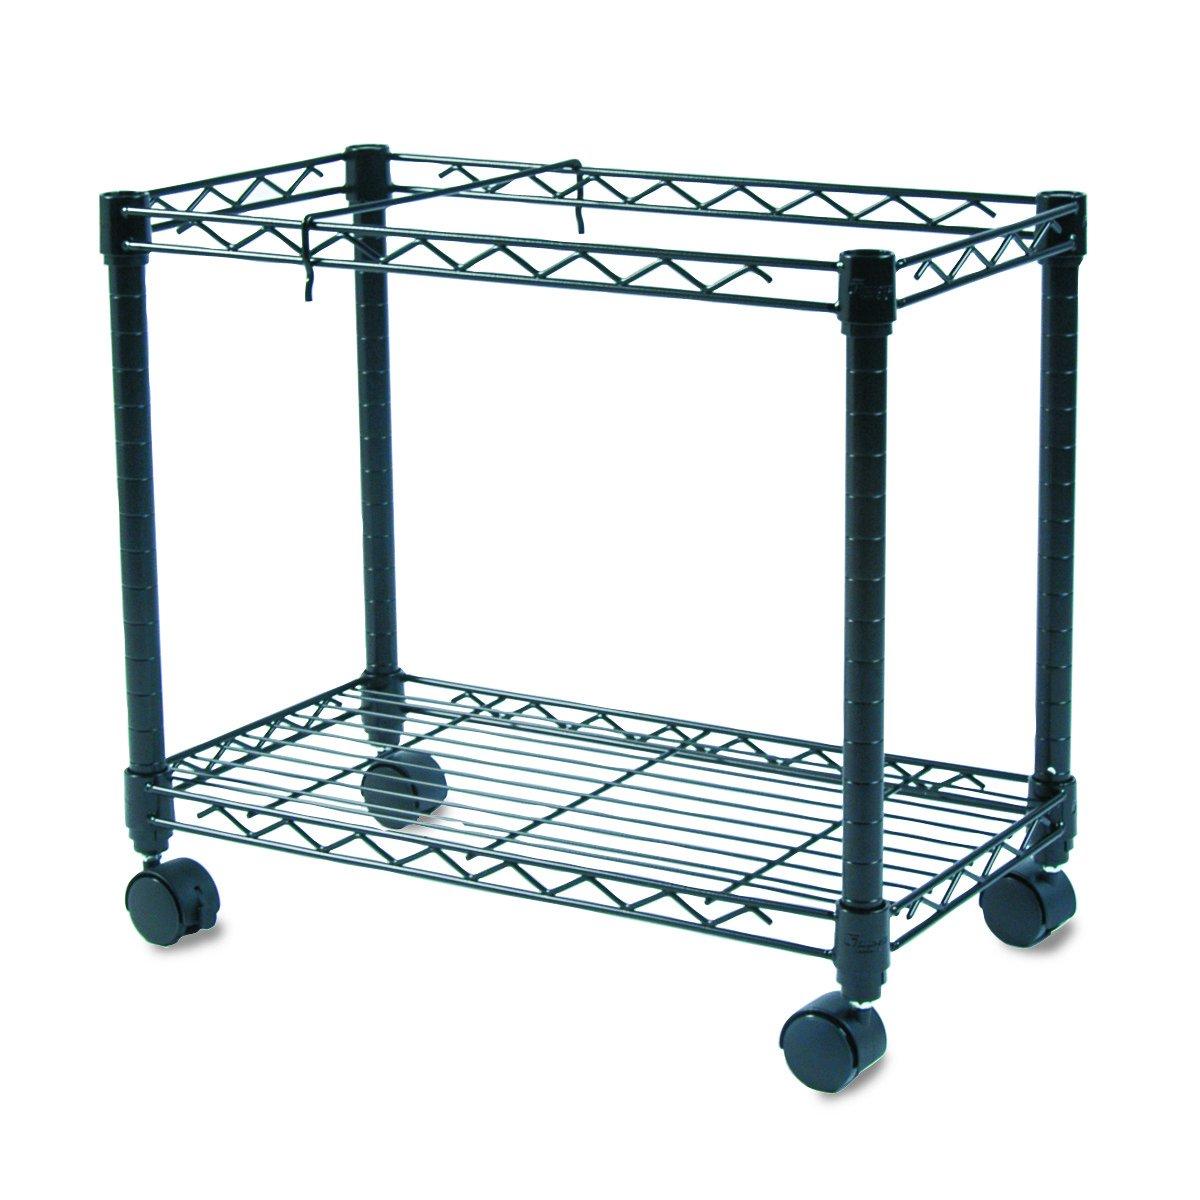 Amazon.com: Fellowes 45081 High-Capacity Mobile File Cart, 24w x14d ...